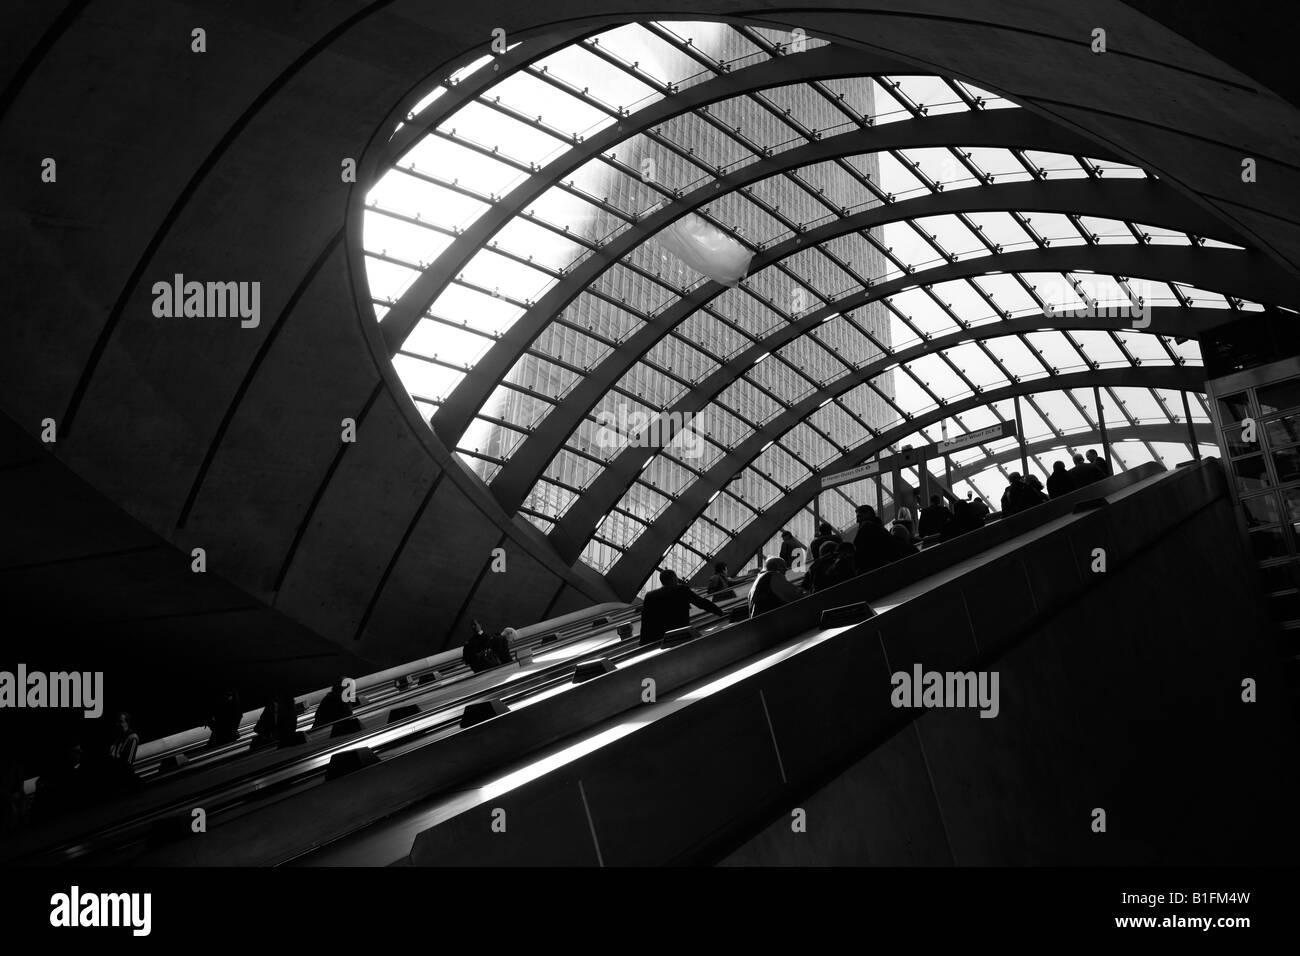 Escalators at Canary Wharf tube station, Docklands, London - Stock Image